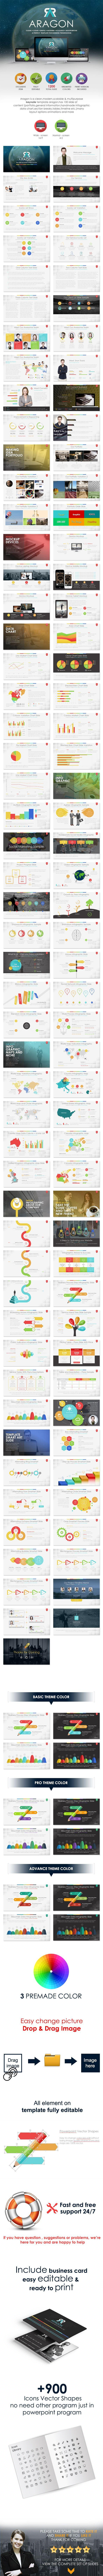 ARAGON - Multipurpose Keynote Template #design #slides Download: http://graphicriver.net/item/aragon-multipurpose-keynote-template/14288591?ref=ksioks